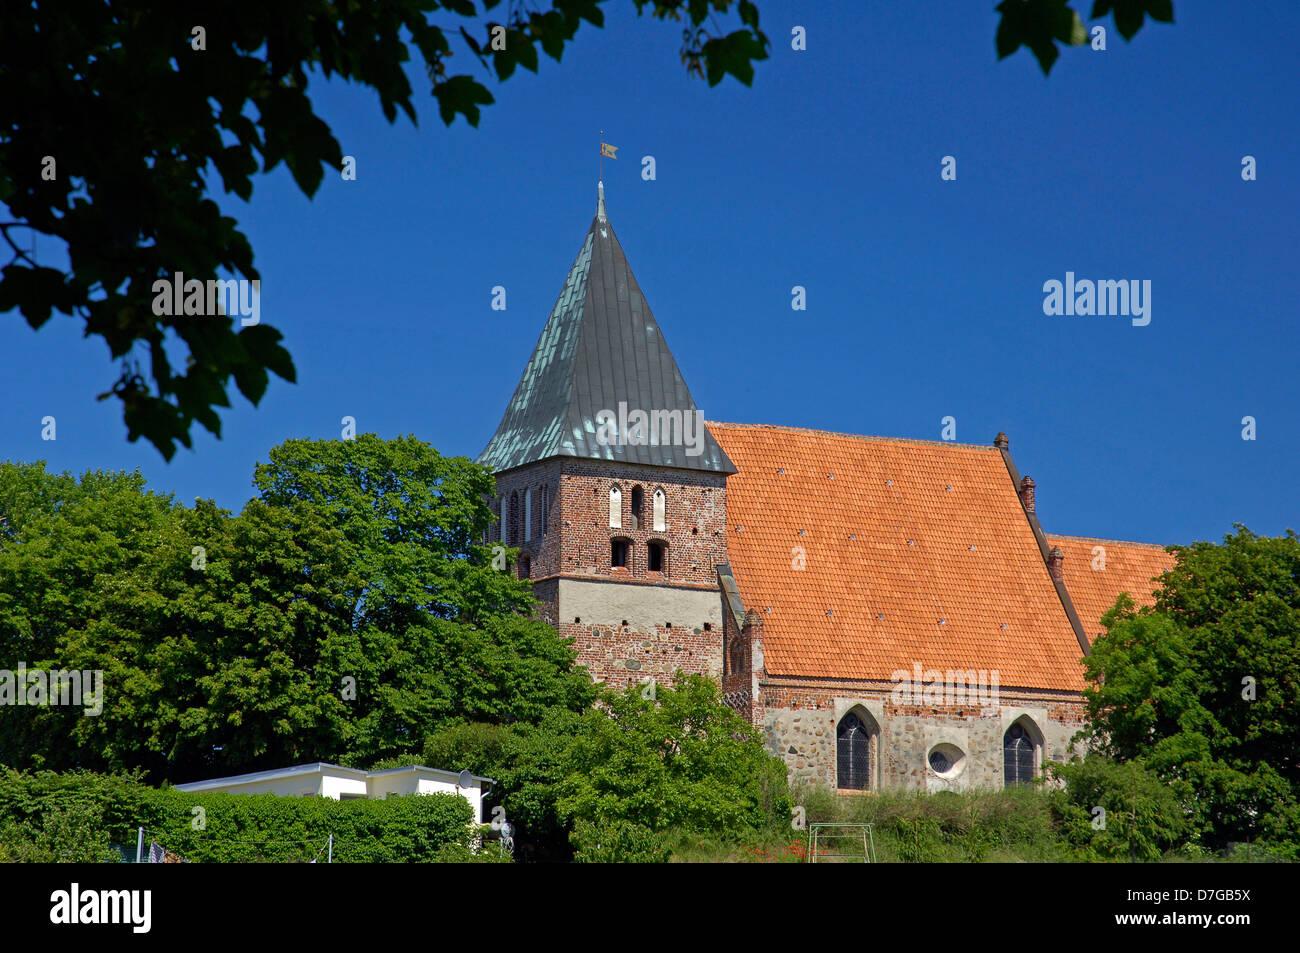 Germany, Mecklenburg-West Pomerania, island Rügen, fieldstone church Bobbin - Stock Image